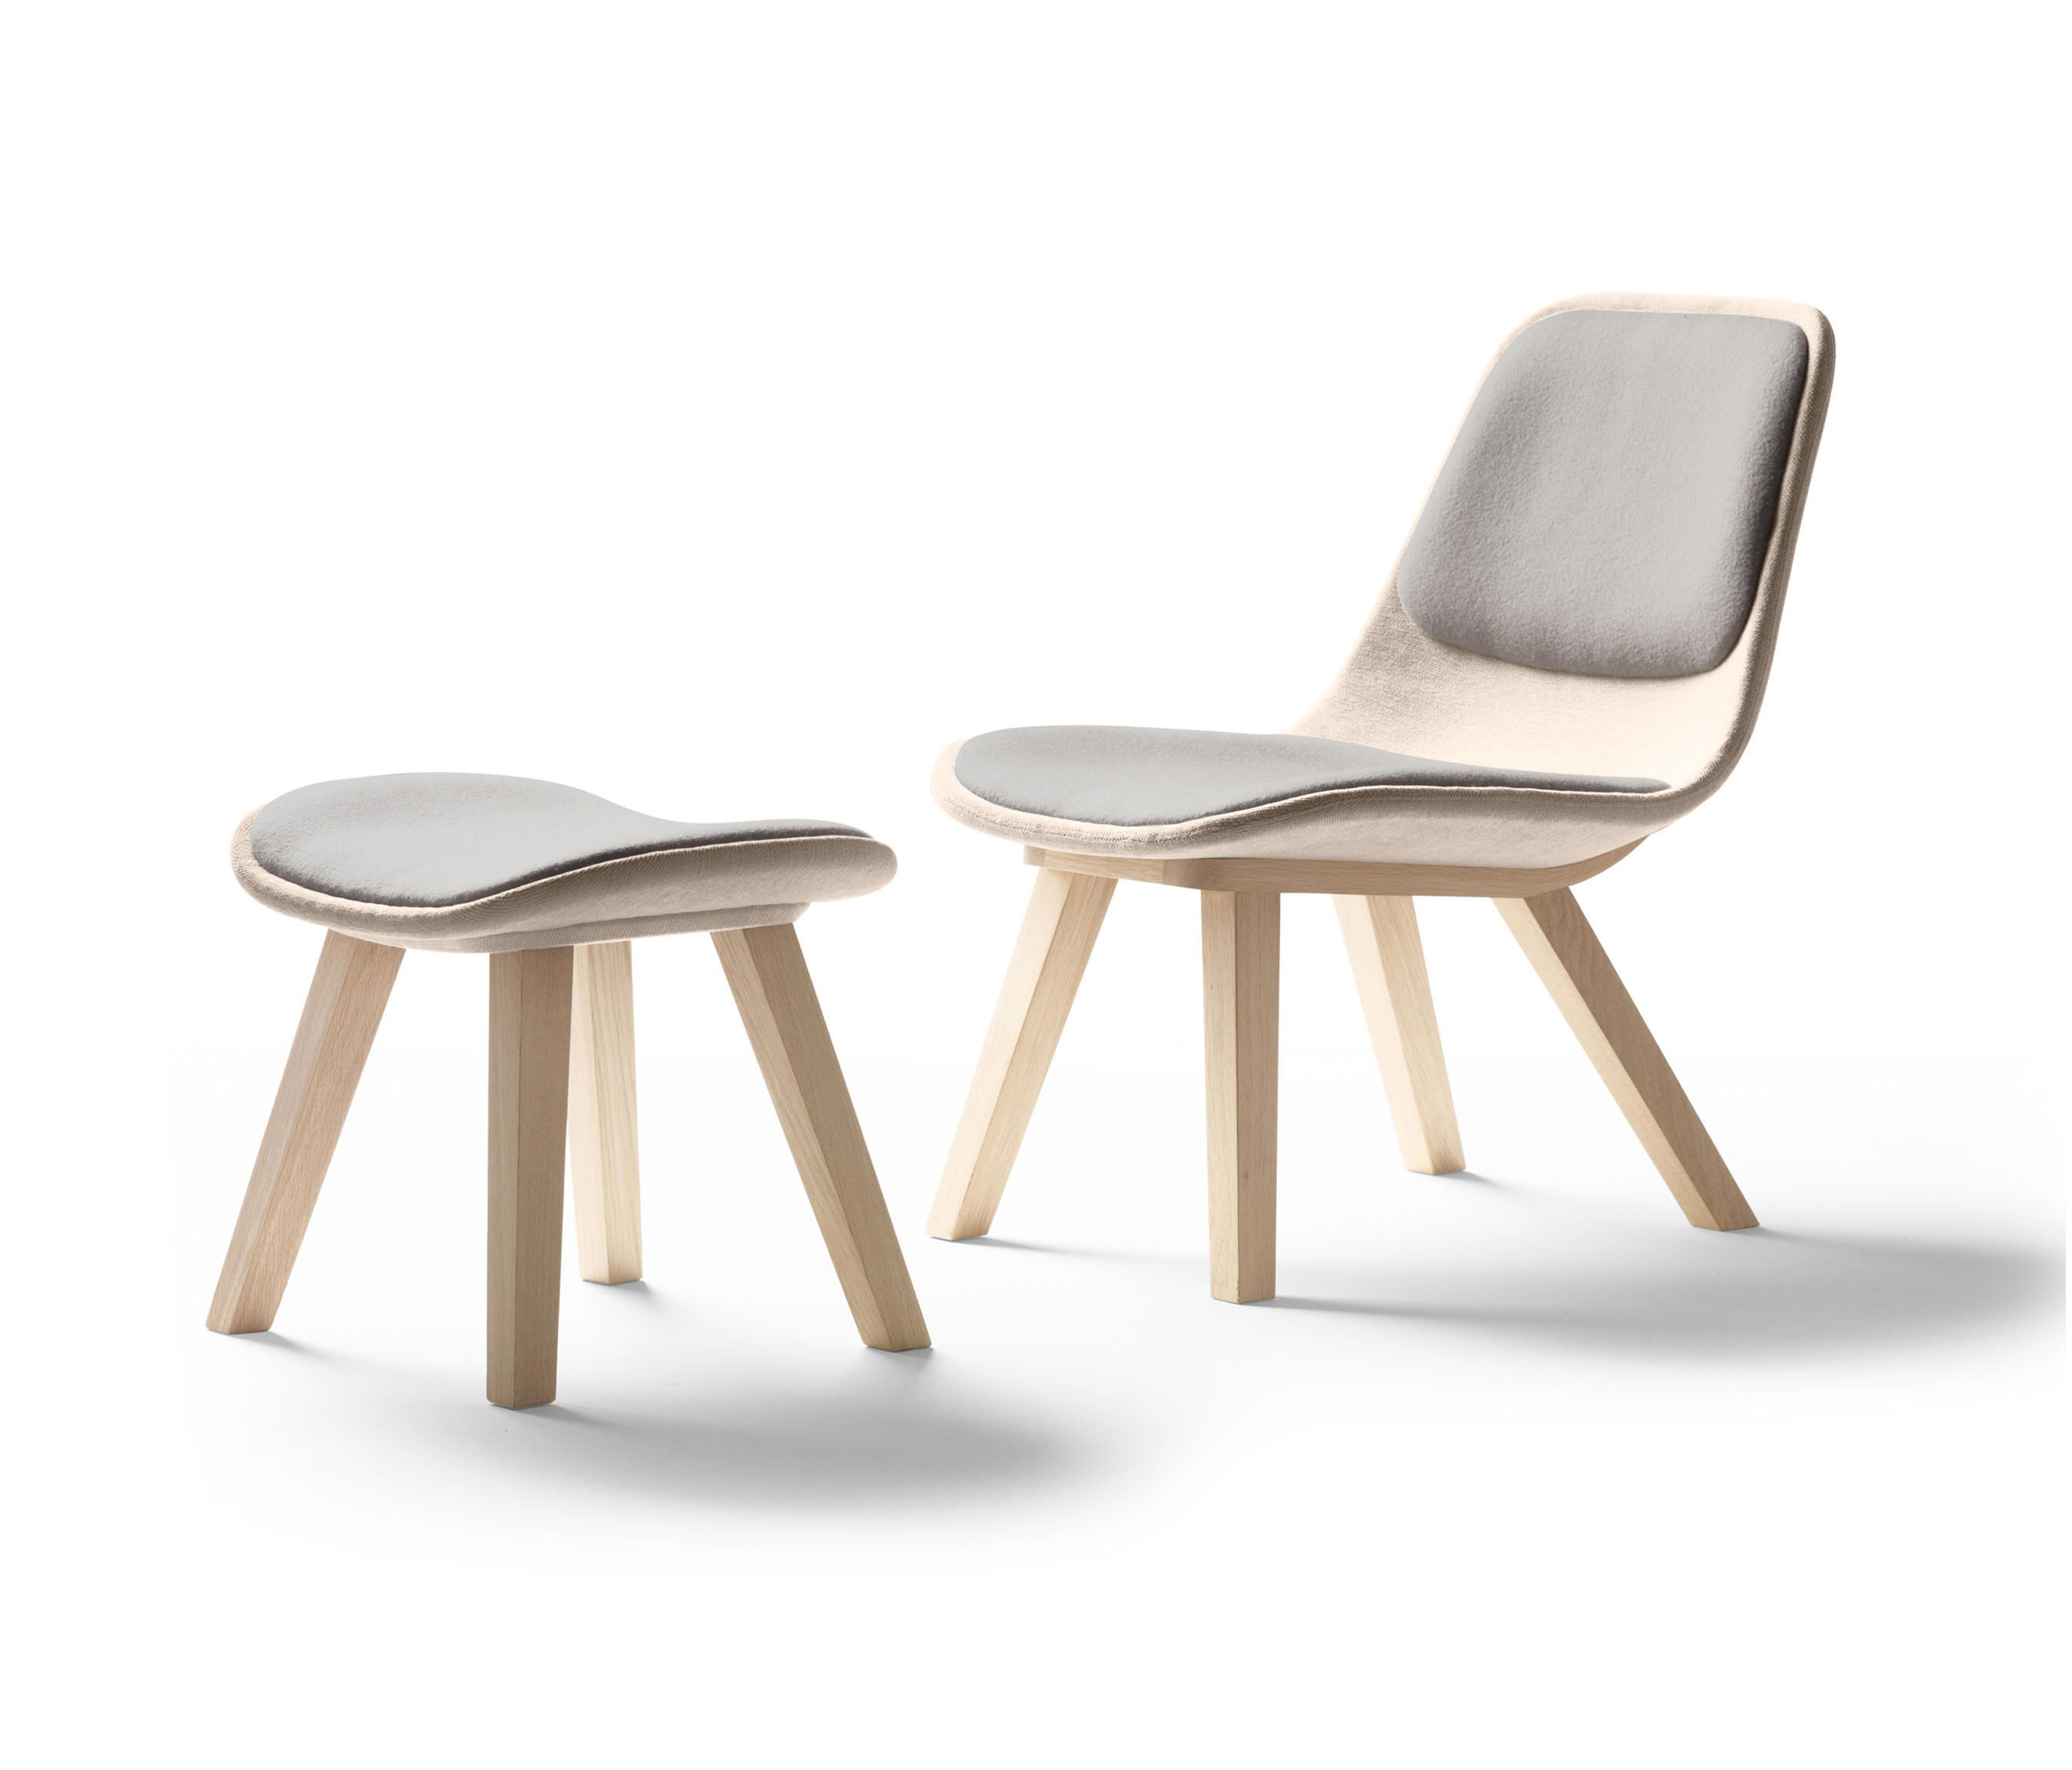 KUSKOA LOUNGE CHAIR  Armchairs from Alki  Architonic